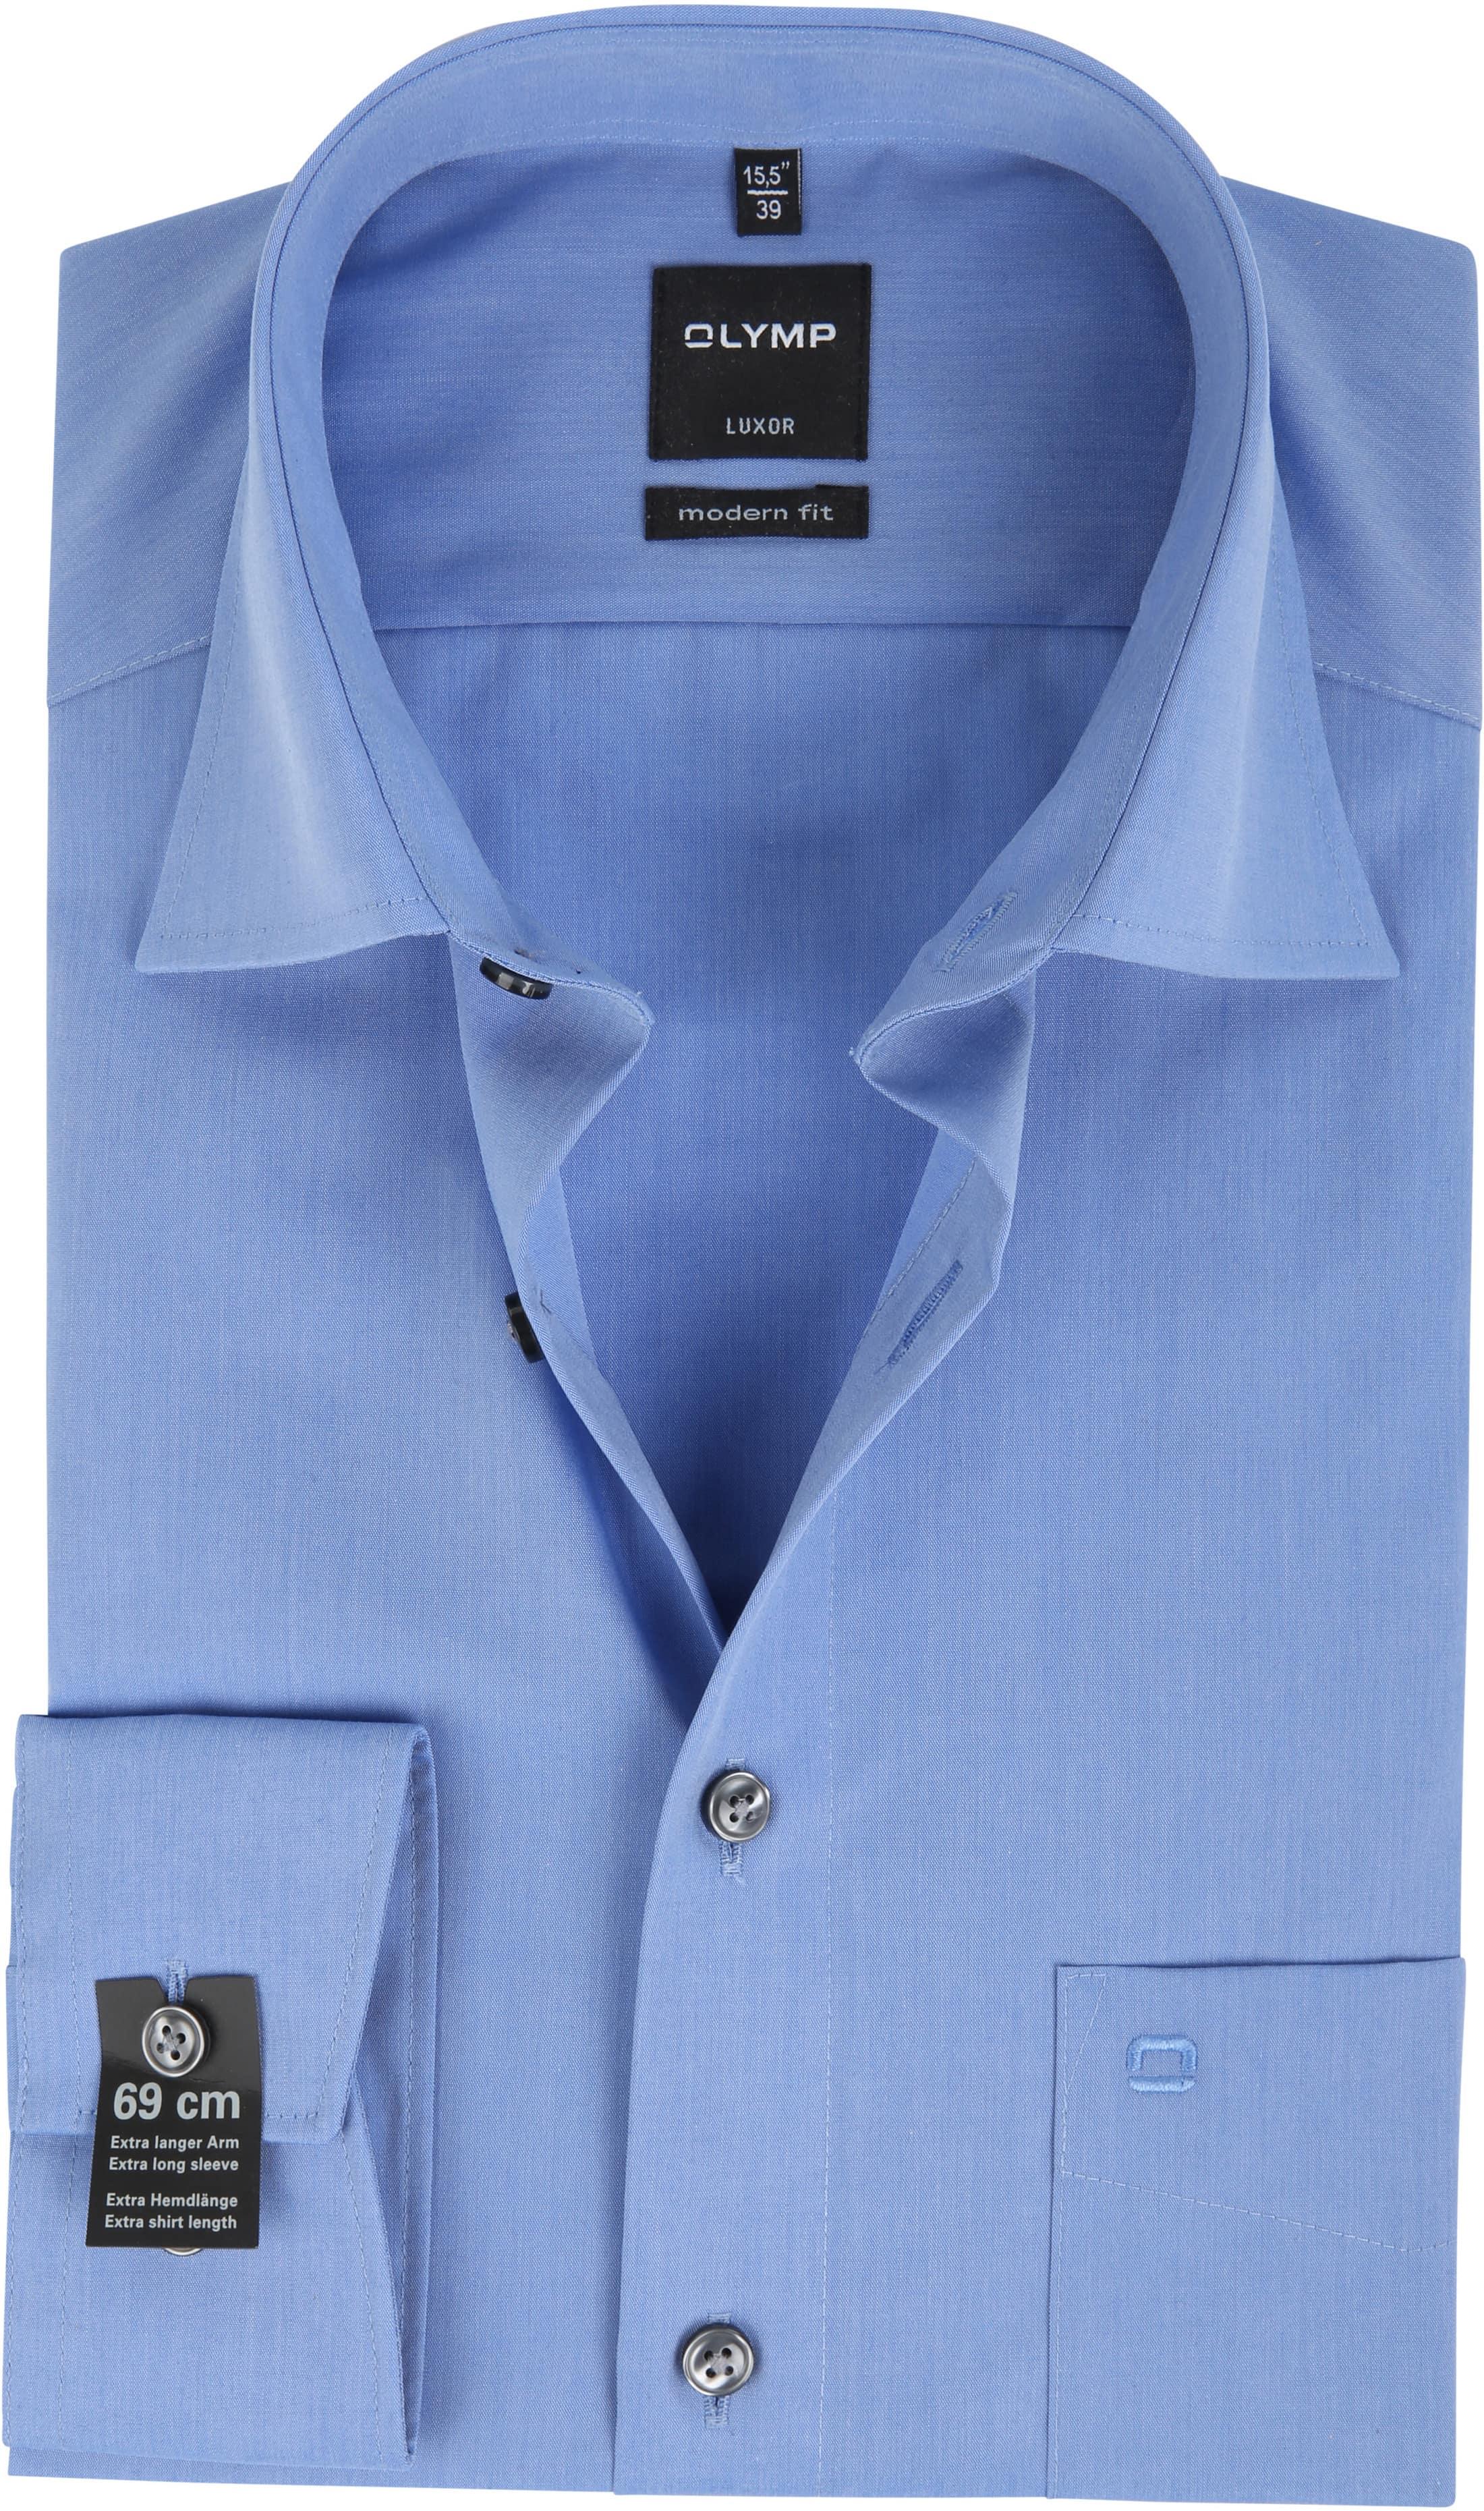 OLYMP Overhemd SL7 Blauw Chambray foto 0